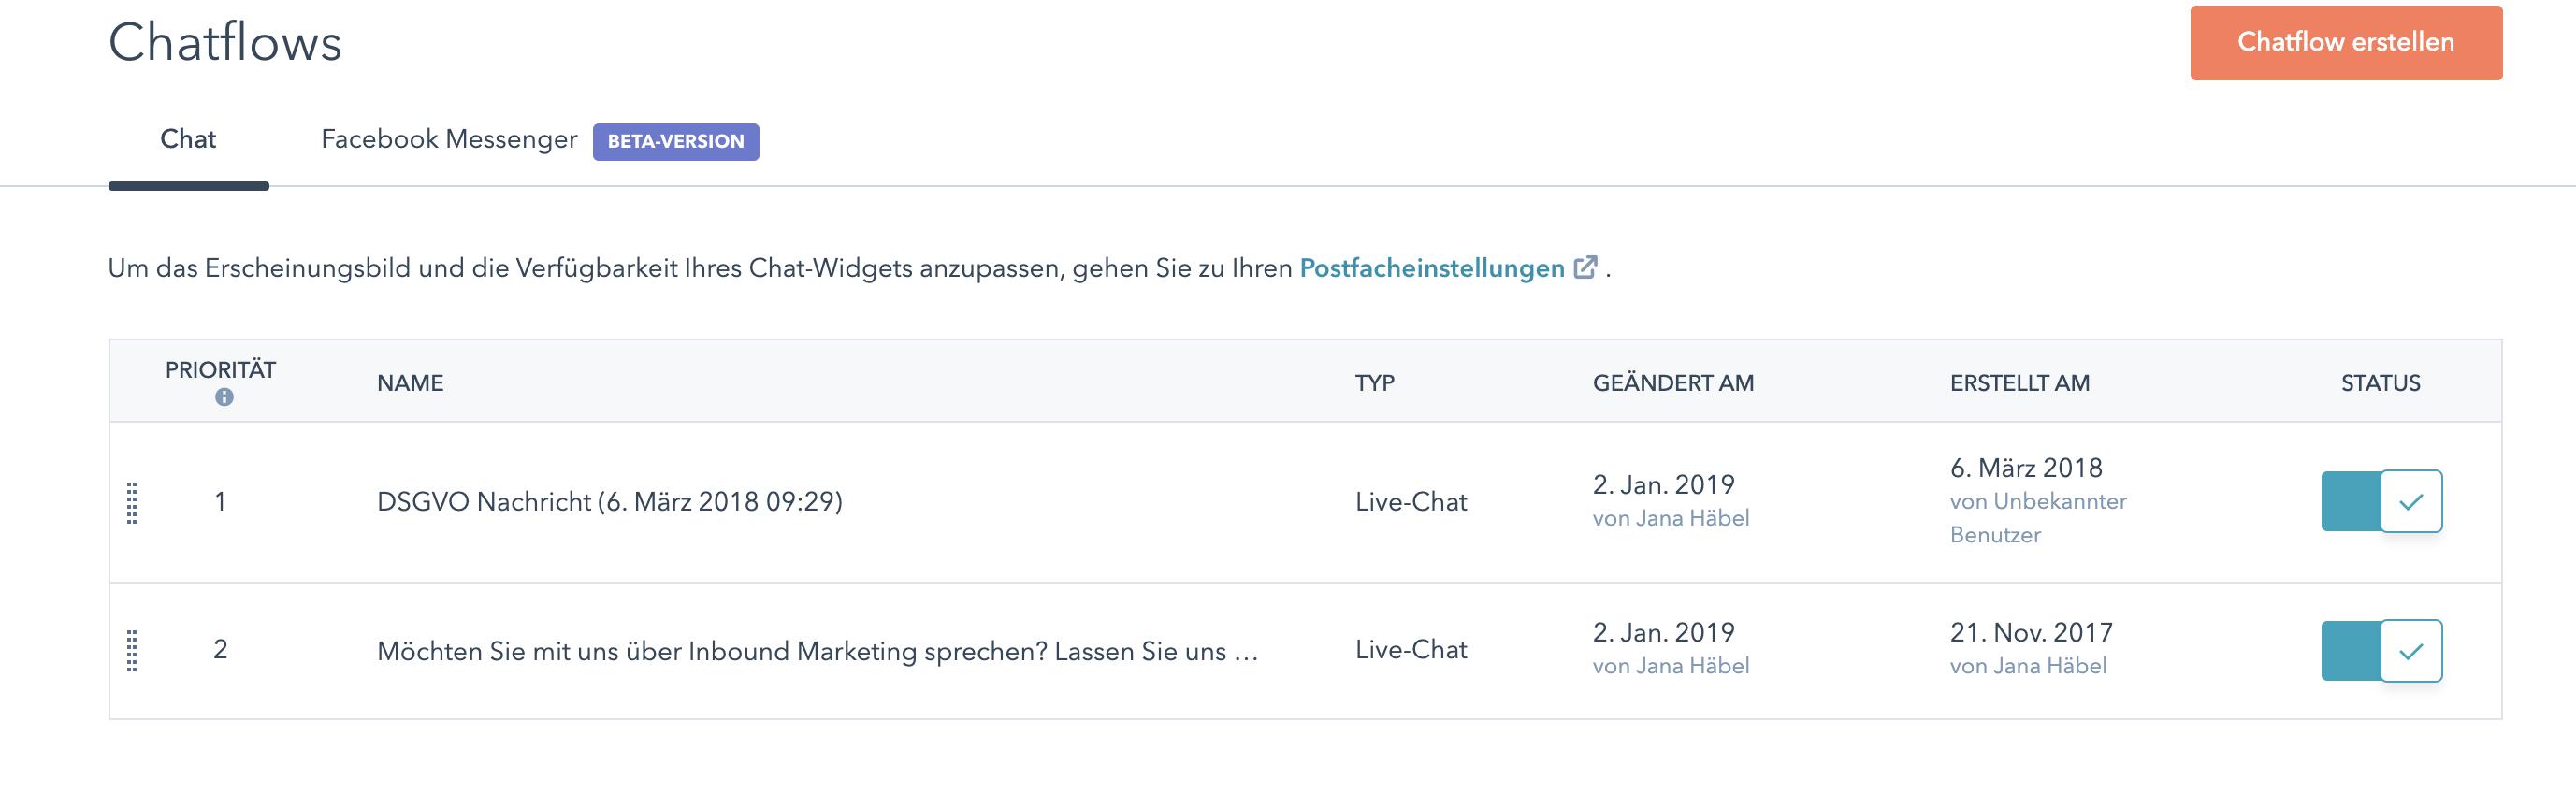 Chatflow Priorität